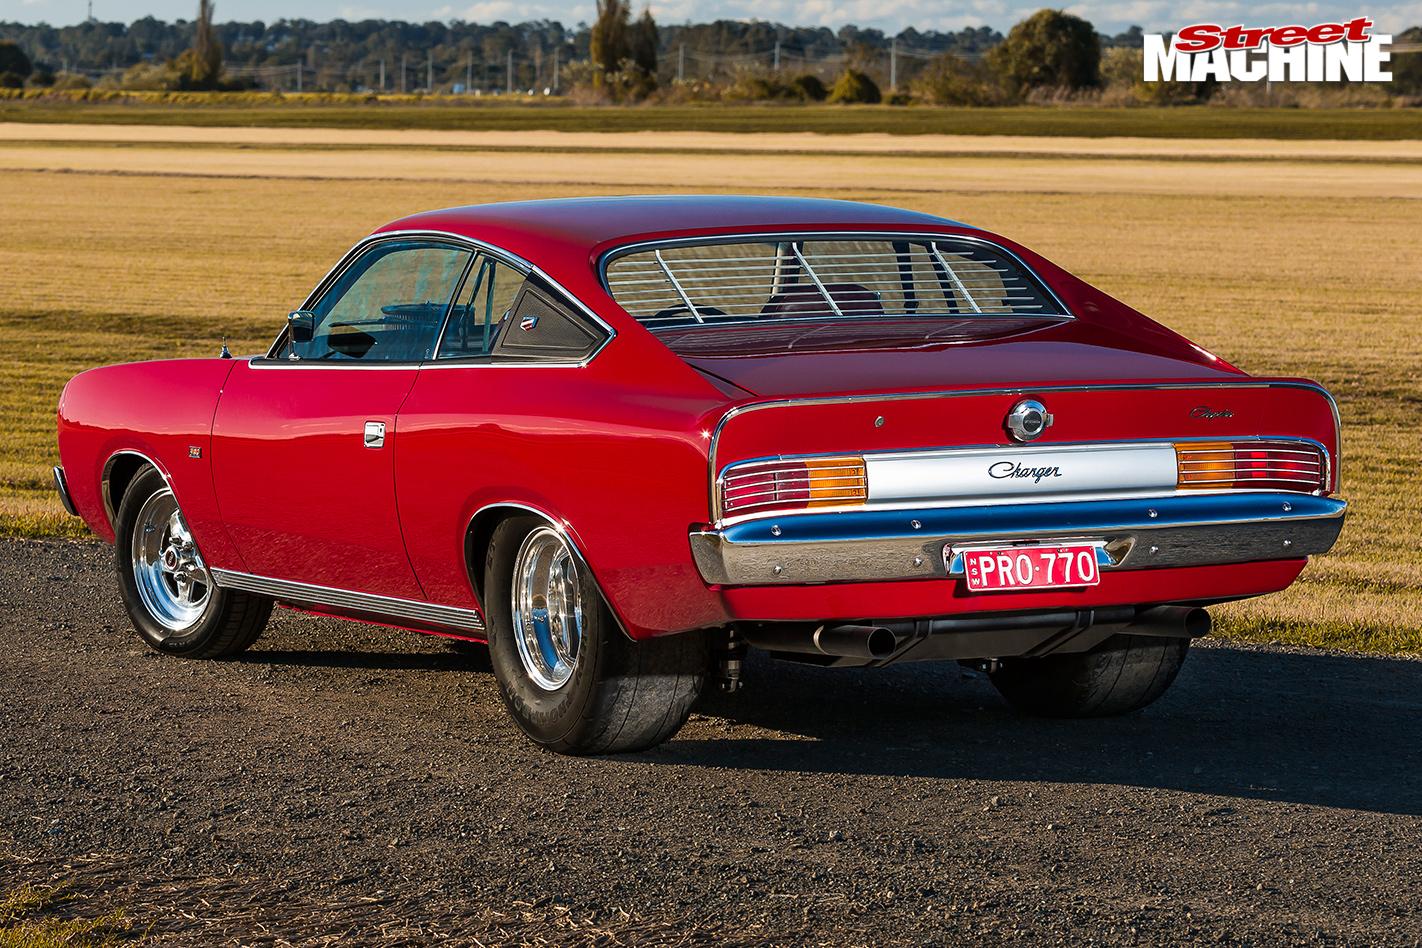 Chrysler -cl -charger -rear -2c -wm